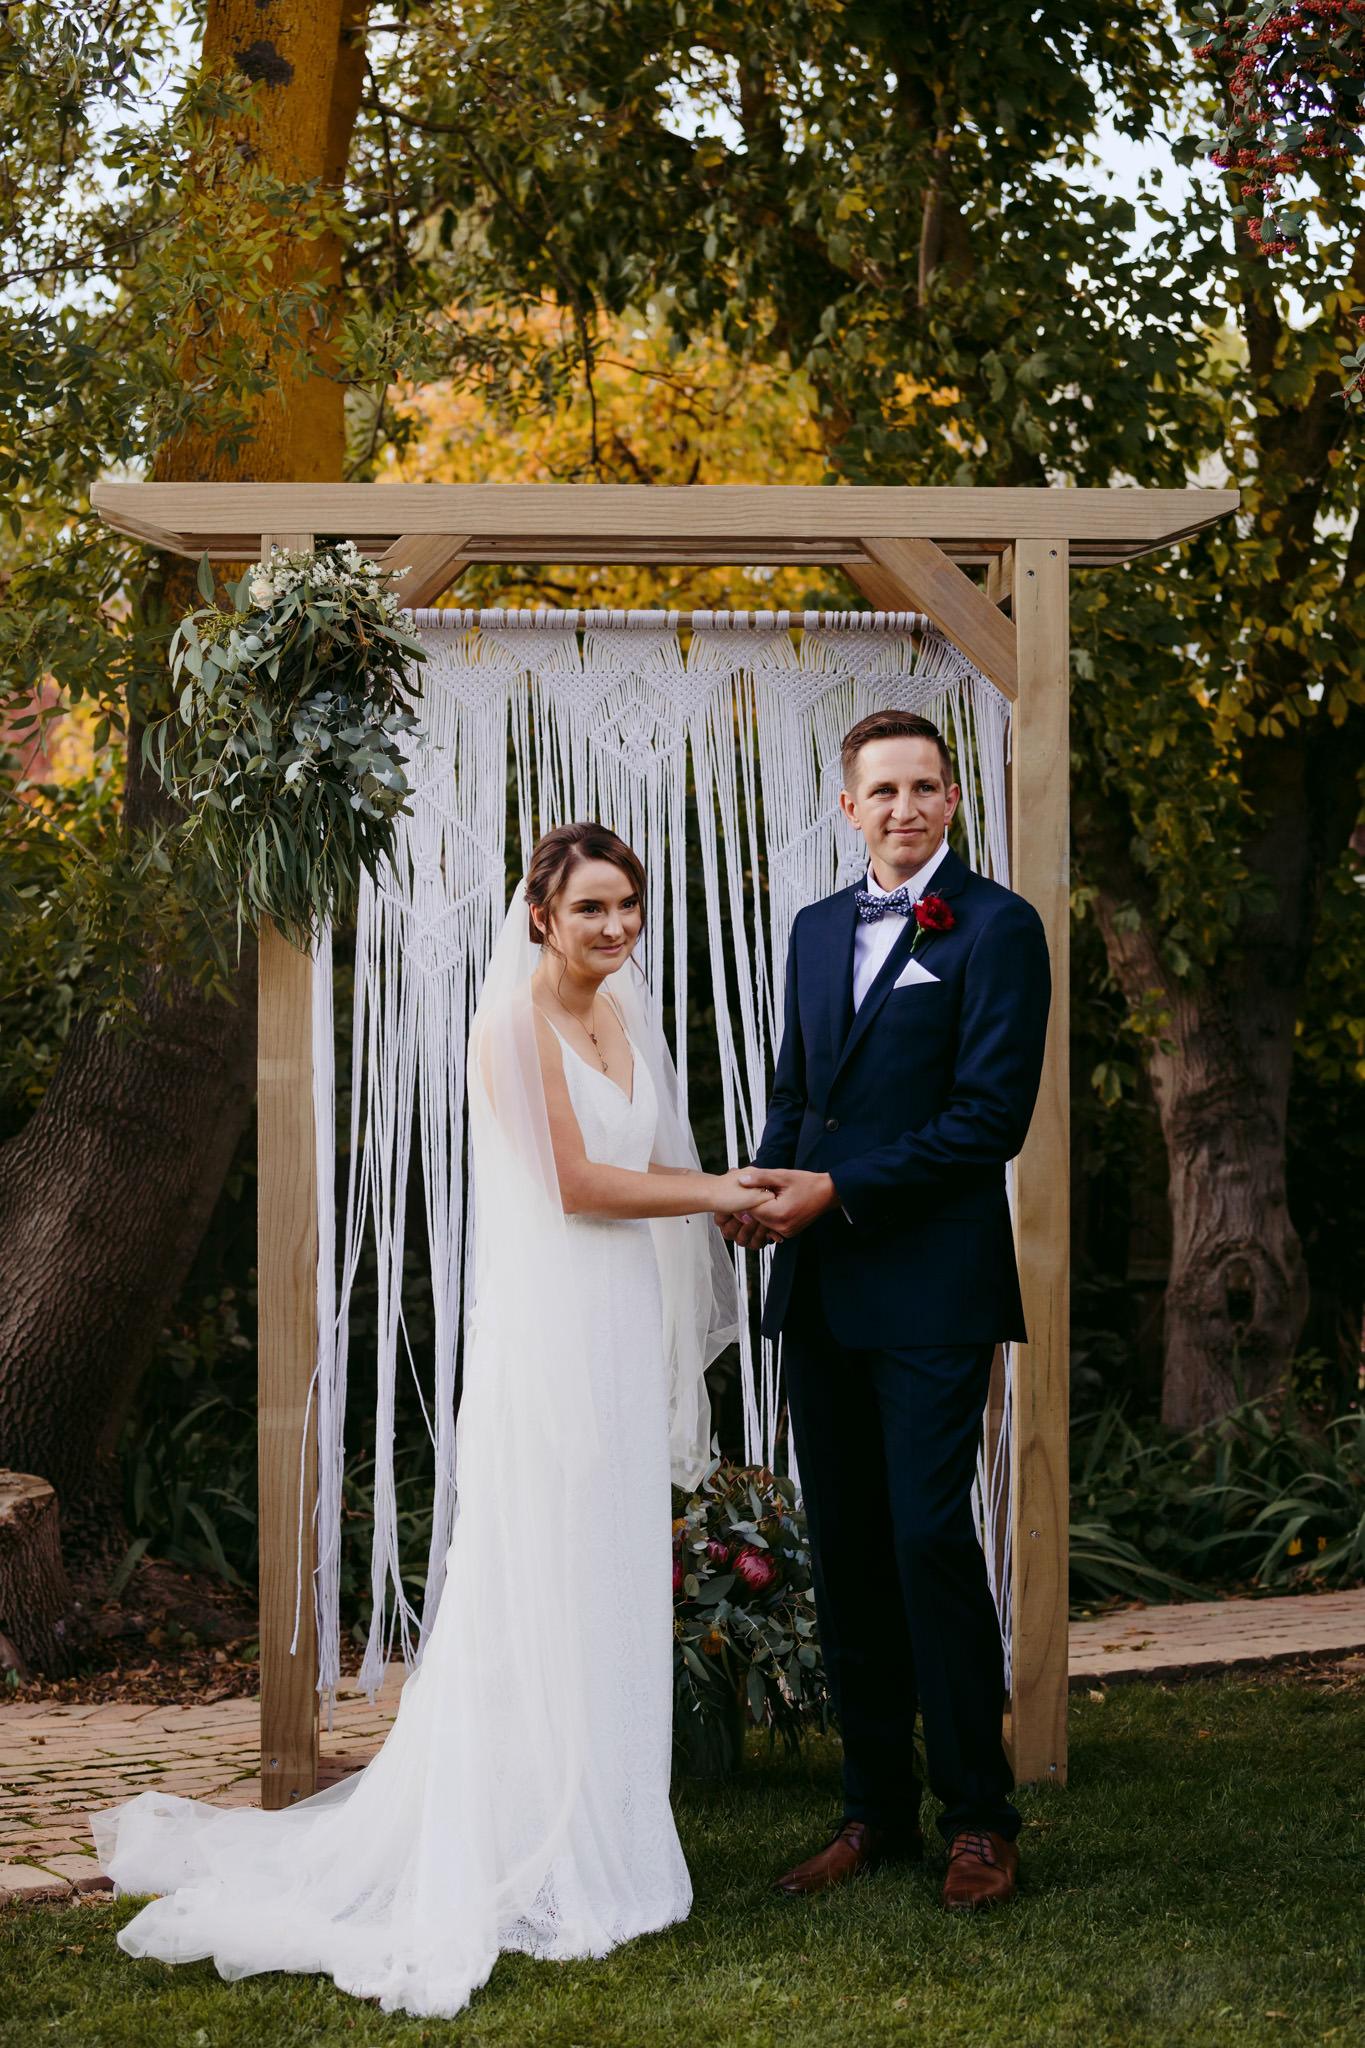 Erin Latimore Mudgee Canberra Wedding Photographer ROSEBANK GUESTHOUSE OLD THEATRE TONIC MILLTHORPE_217.JPG